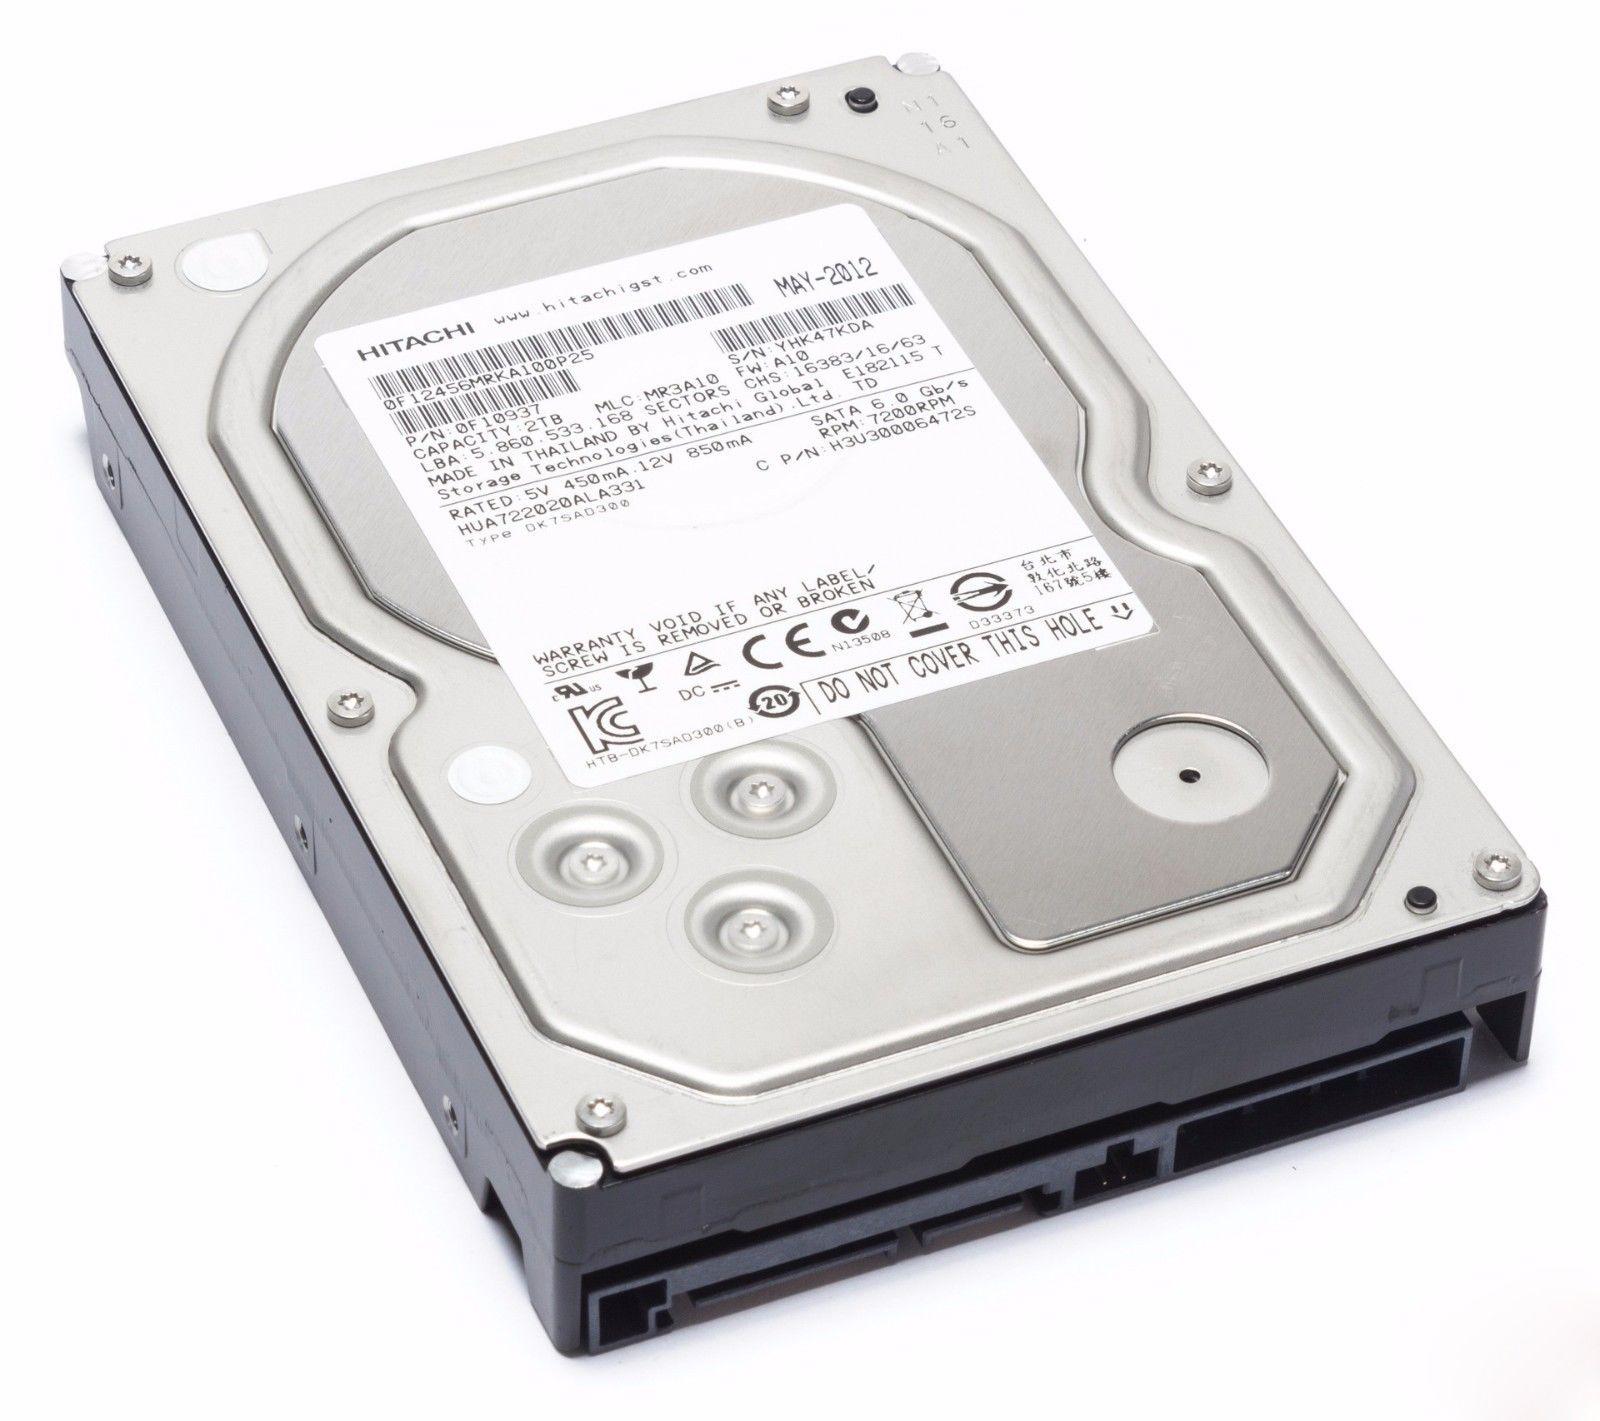 Hitachi Ultrastar A7K2000 HUA722020ALA331 2TB 32MB Cache Internal Hard Drive (Refurbished) $33 + Free Shipping!